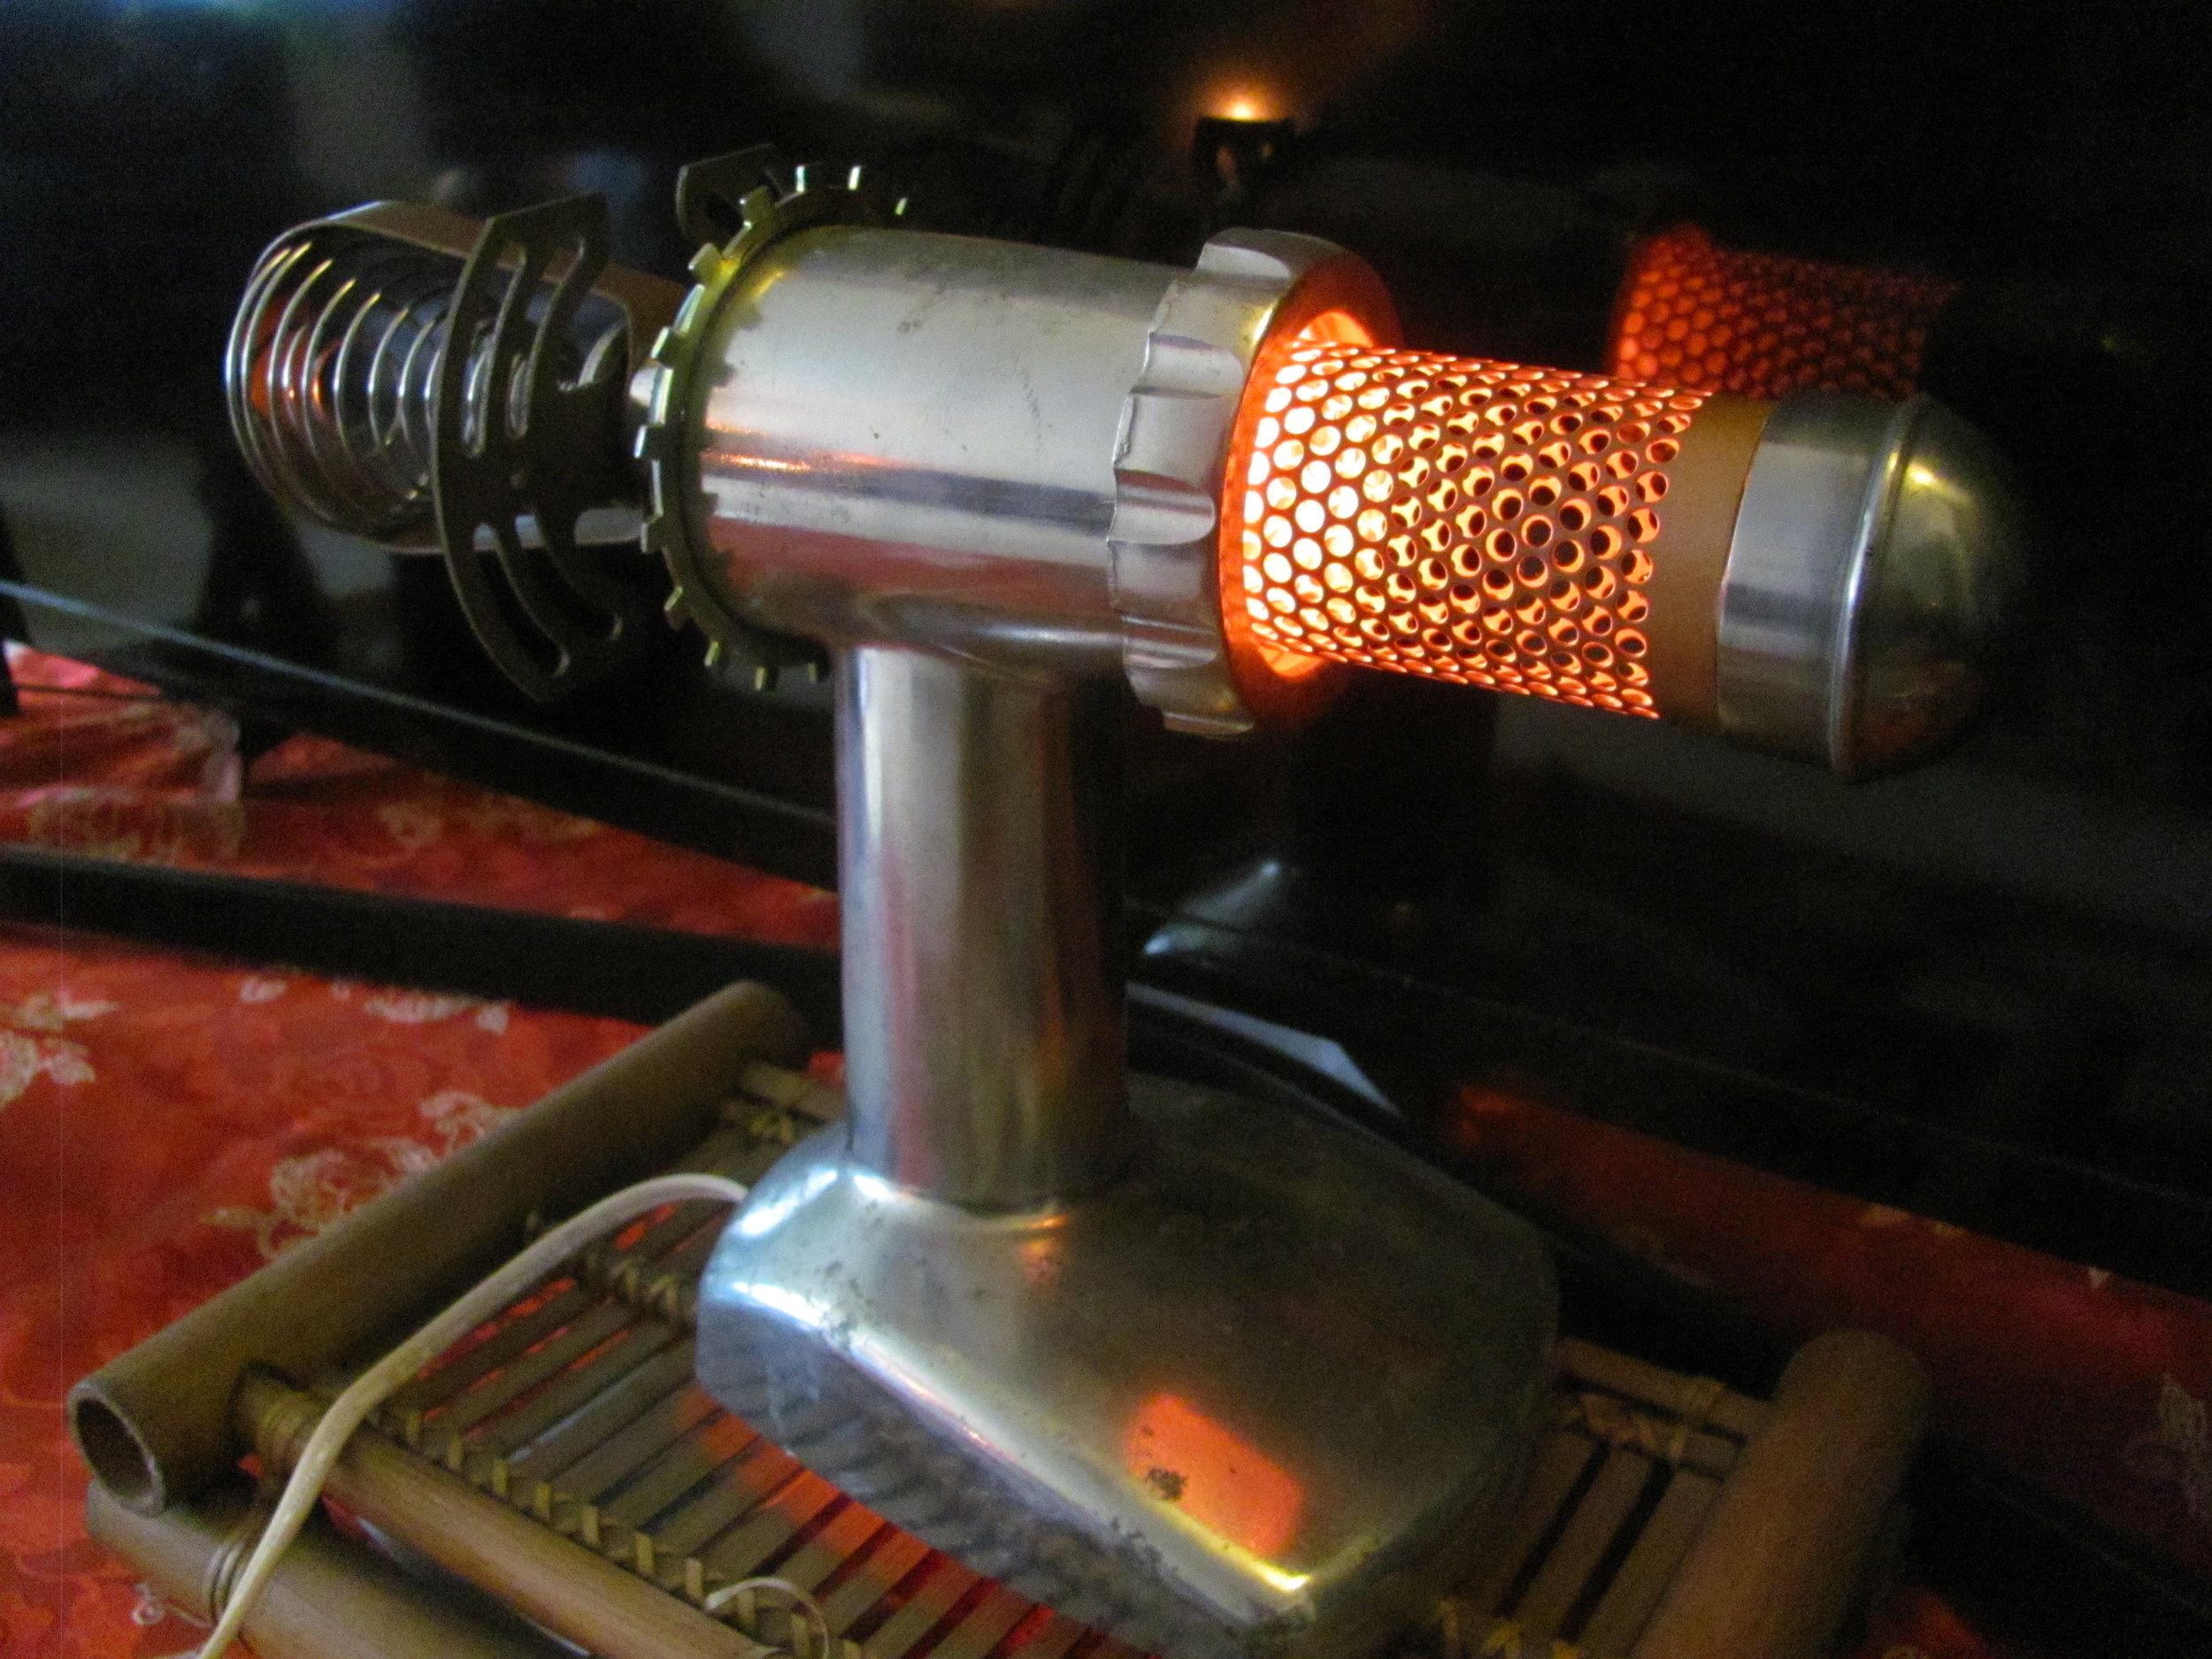 Everett Bone - Cloud Nine Recycled Creations, Assemblage